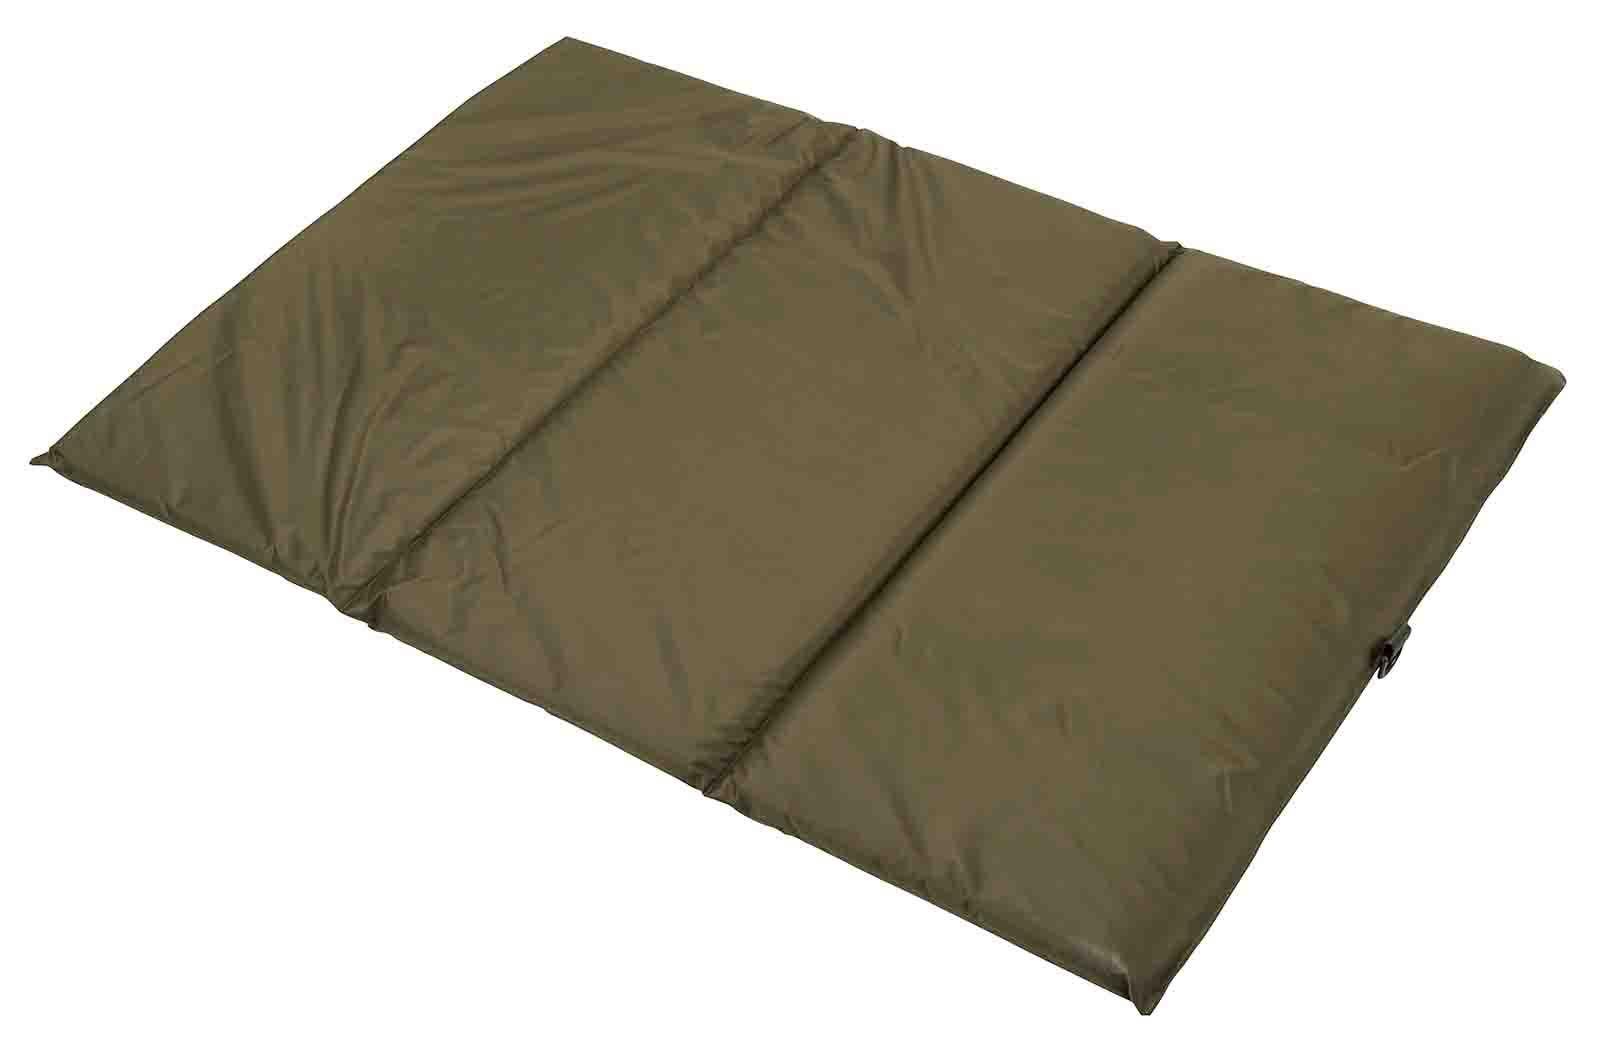 JRC Defender Large Waterproof Roll Up Unhooking Carp Fishing Mat